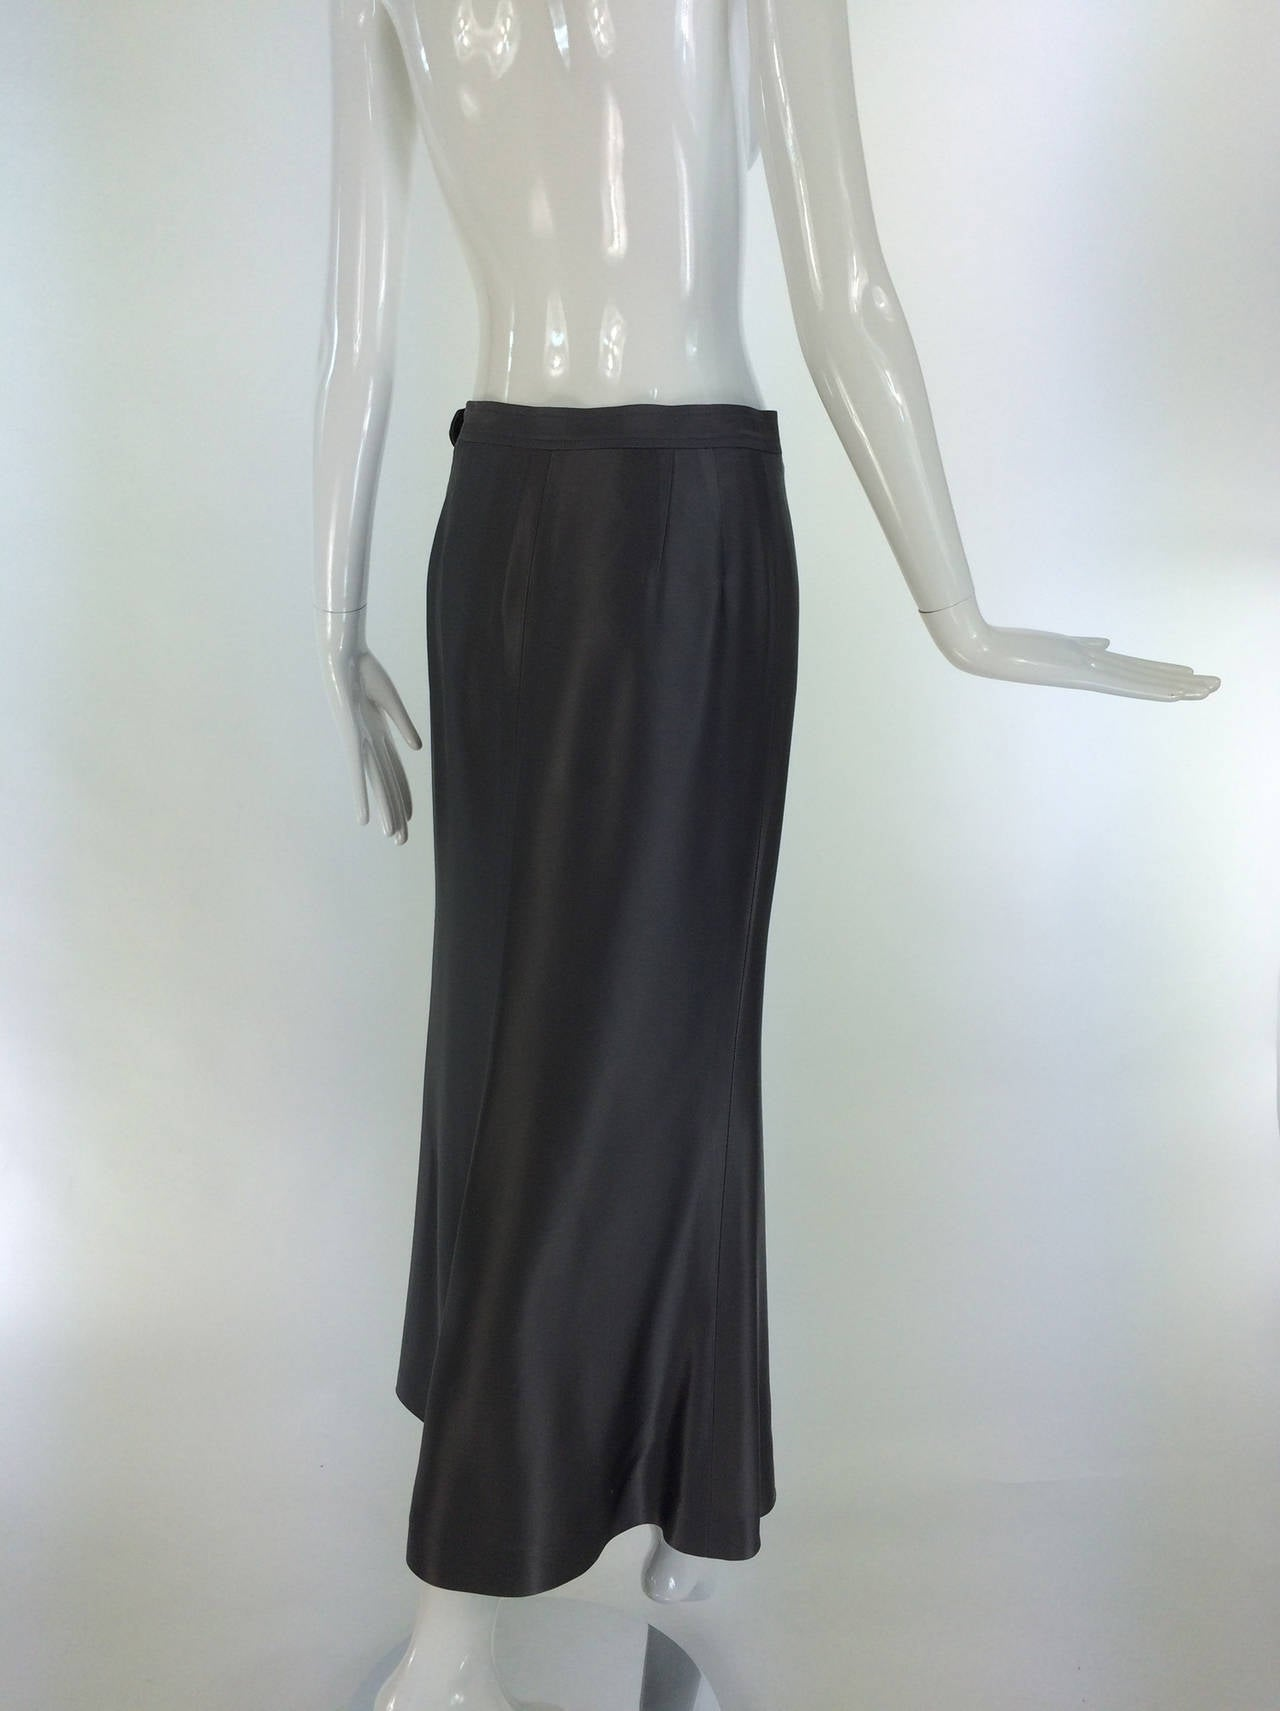 Yves St Laurent Rive Gauche silver grey satin evening skirt 1990s 5